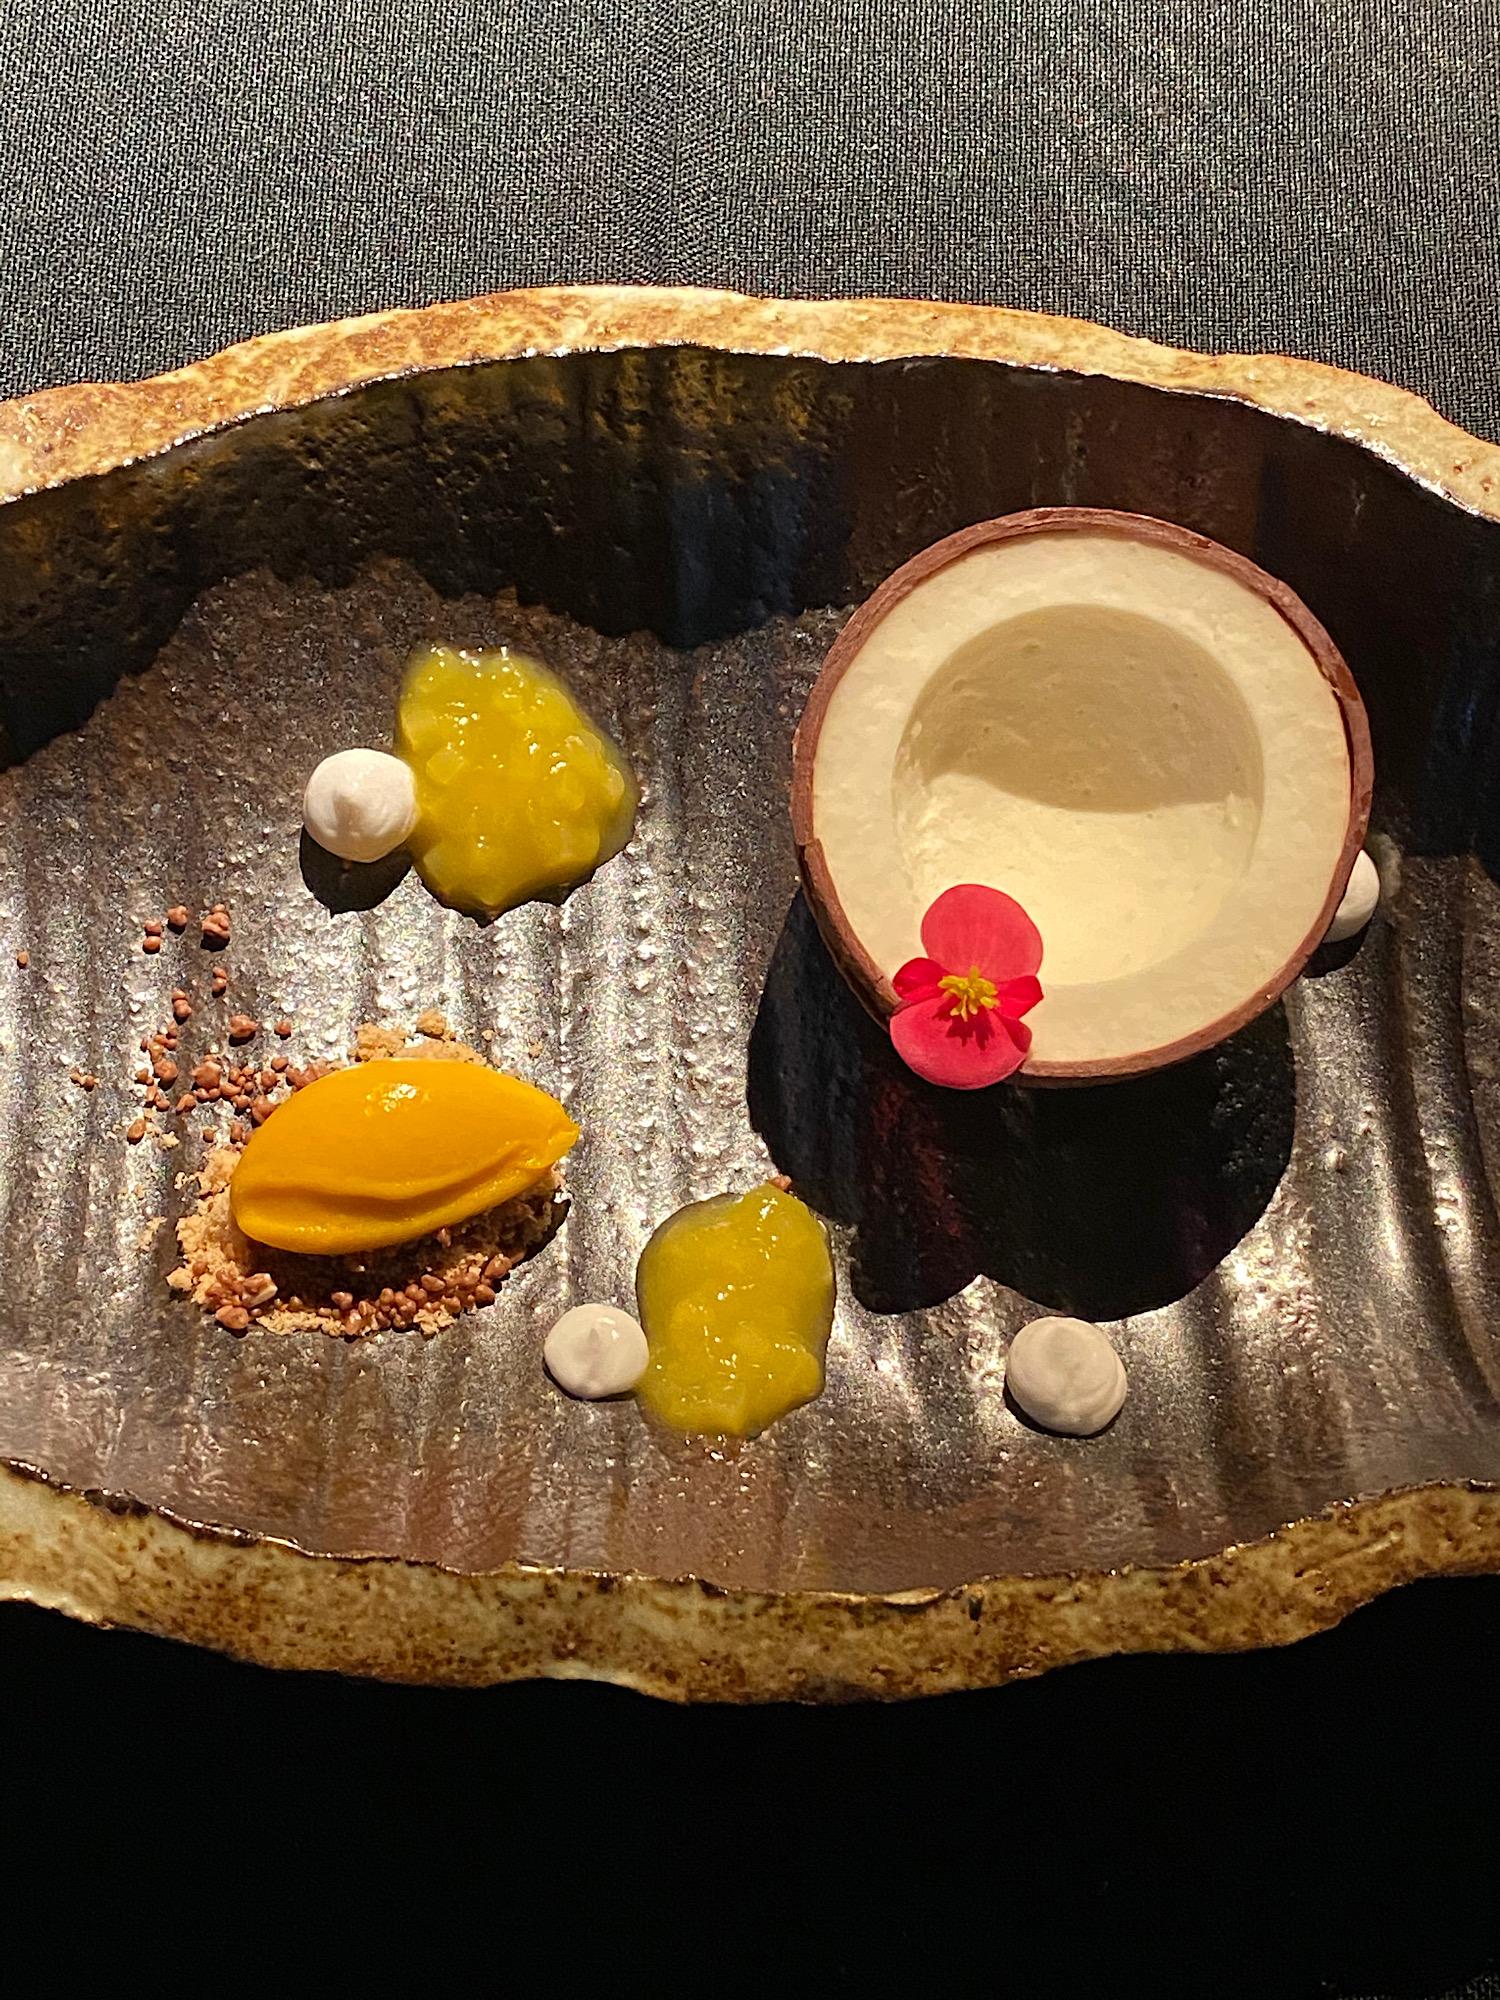 img_1934_3_uncensored_caviar_bull_restaurant_budapest_jokuti_vilagevo.jpg